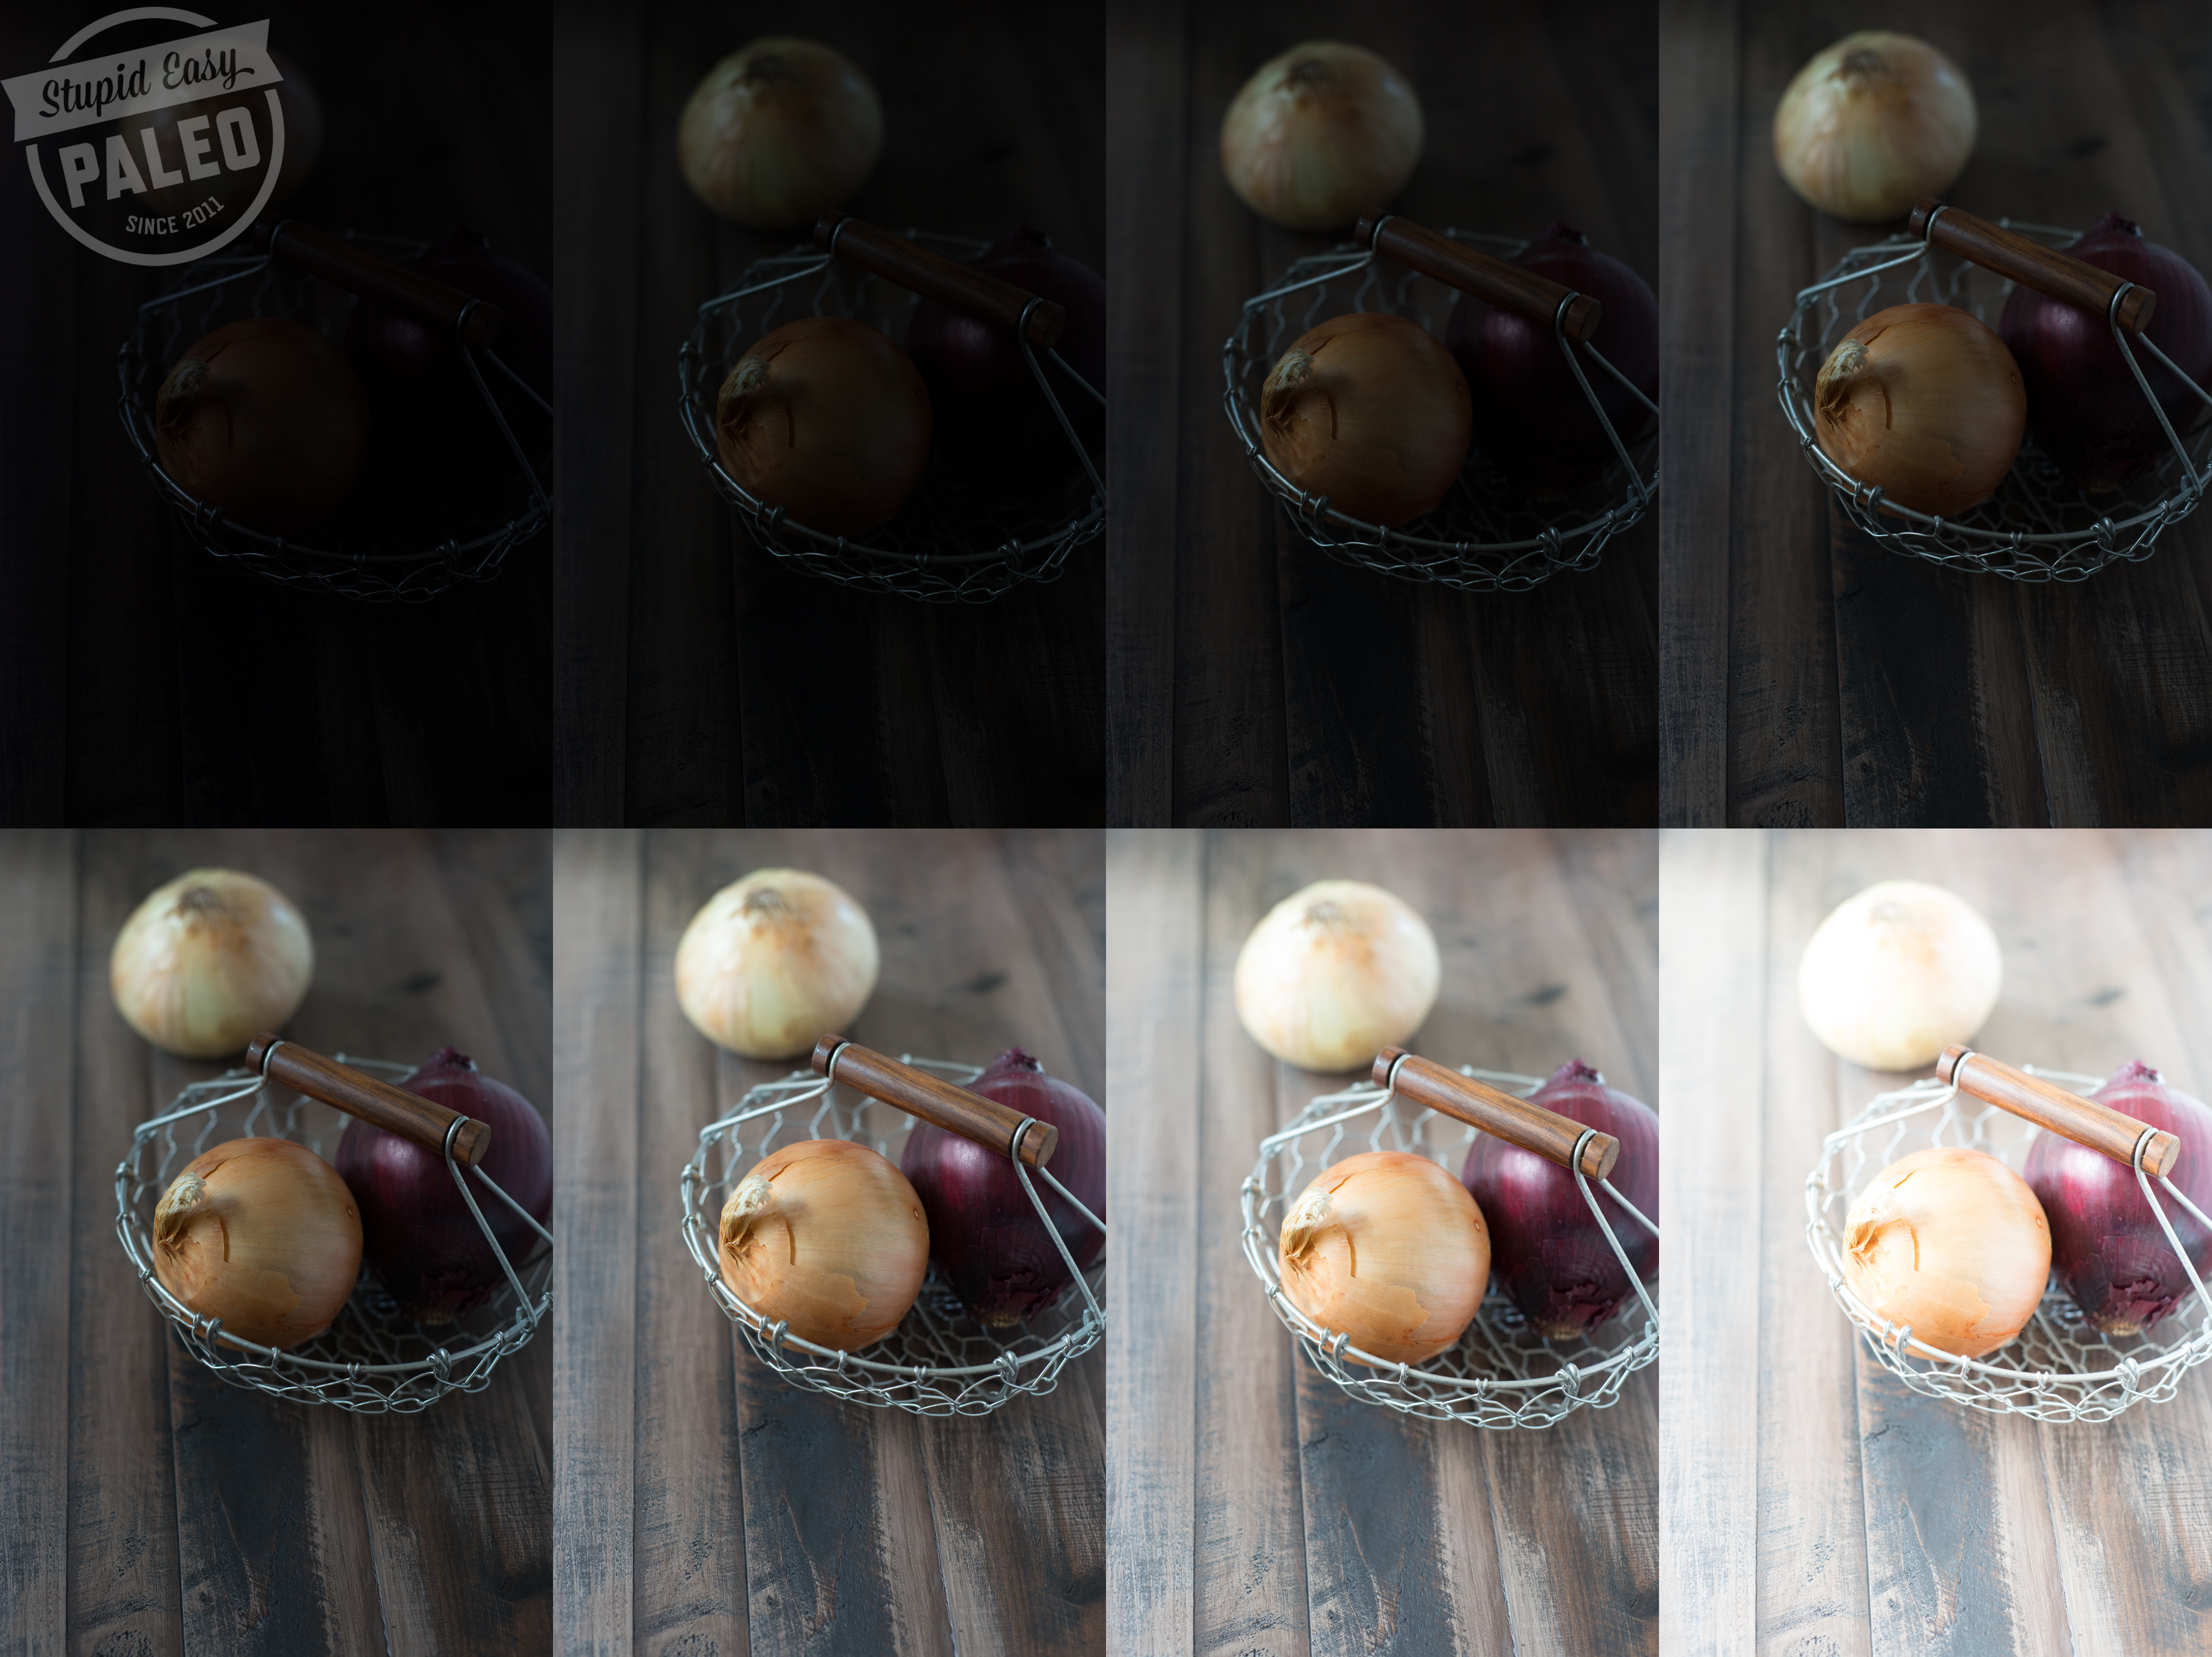 Food Photography Tips: Part 3 | stephgaudreau.com